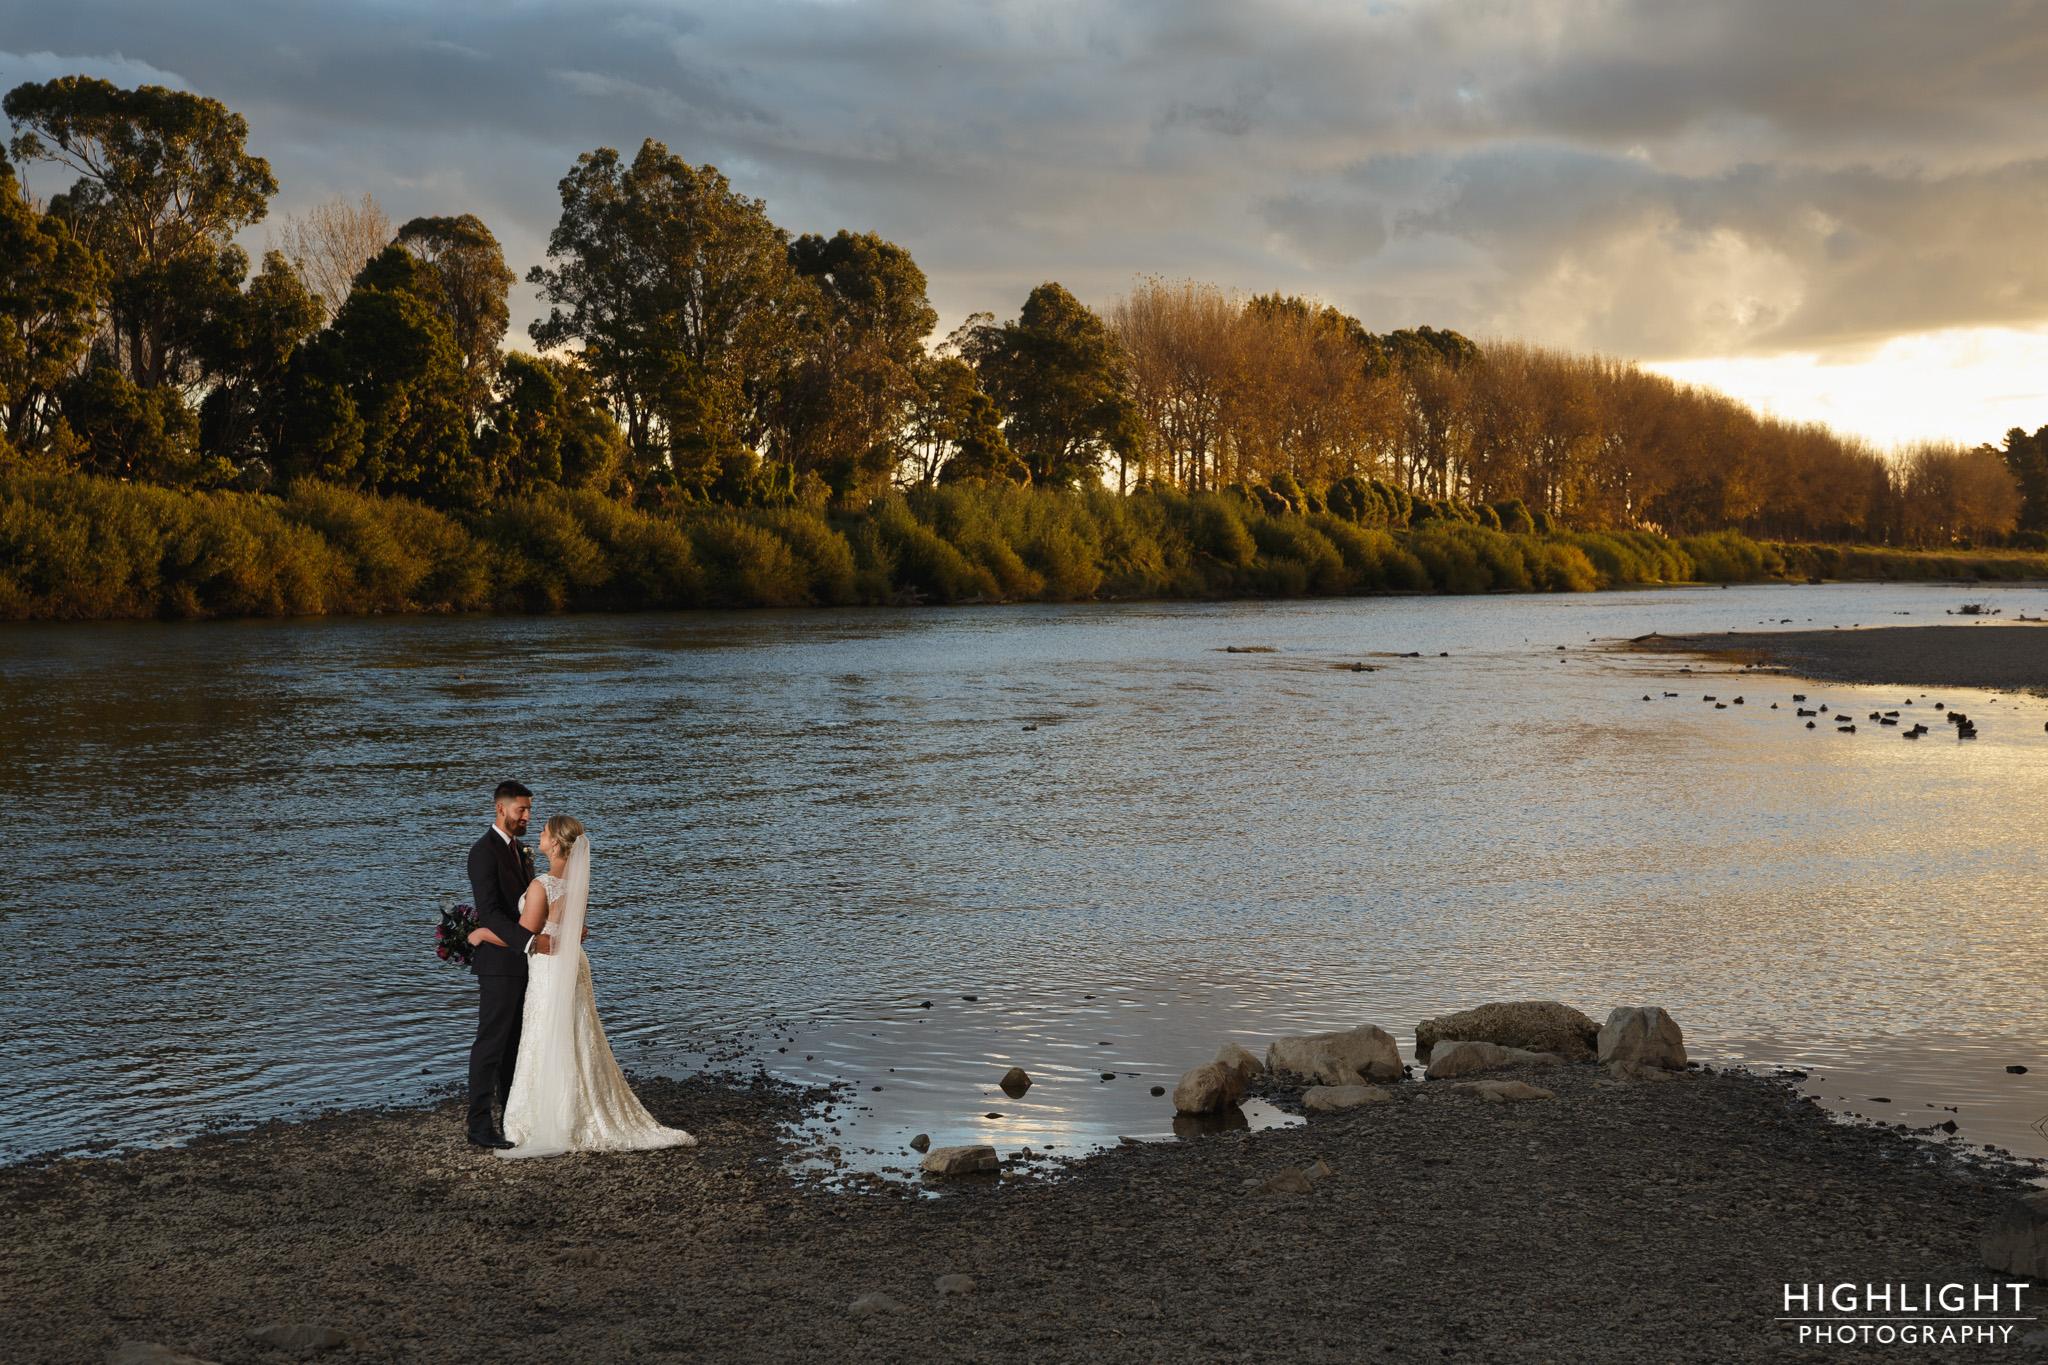 highlight-wedding-photography-feilding-new-zealand-156.jpg